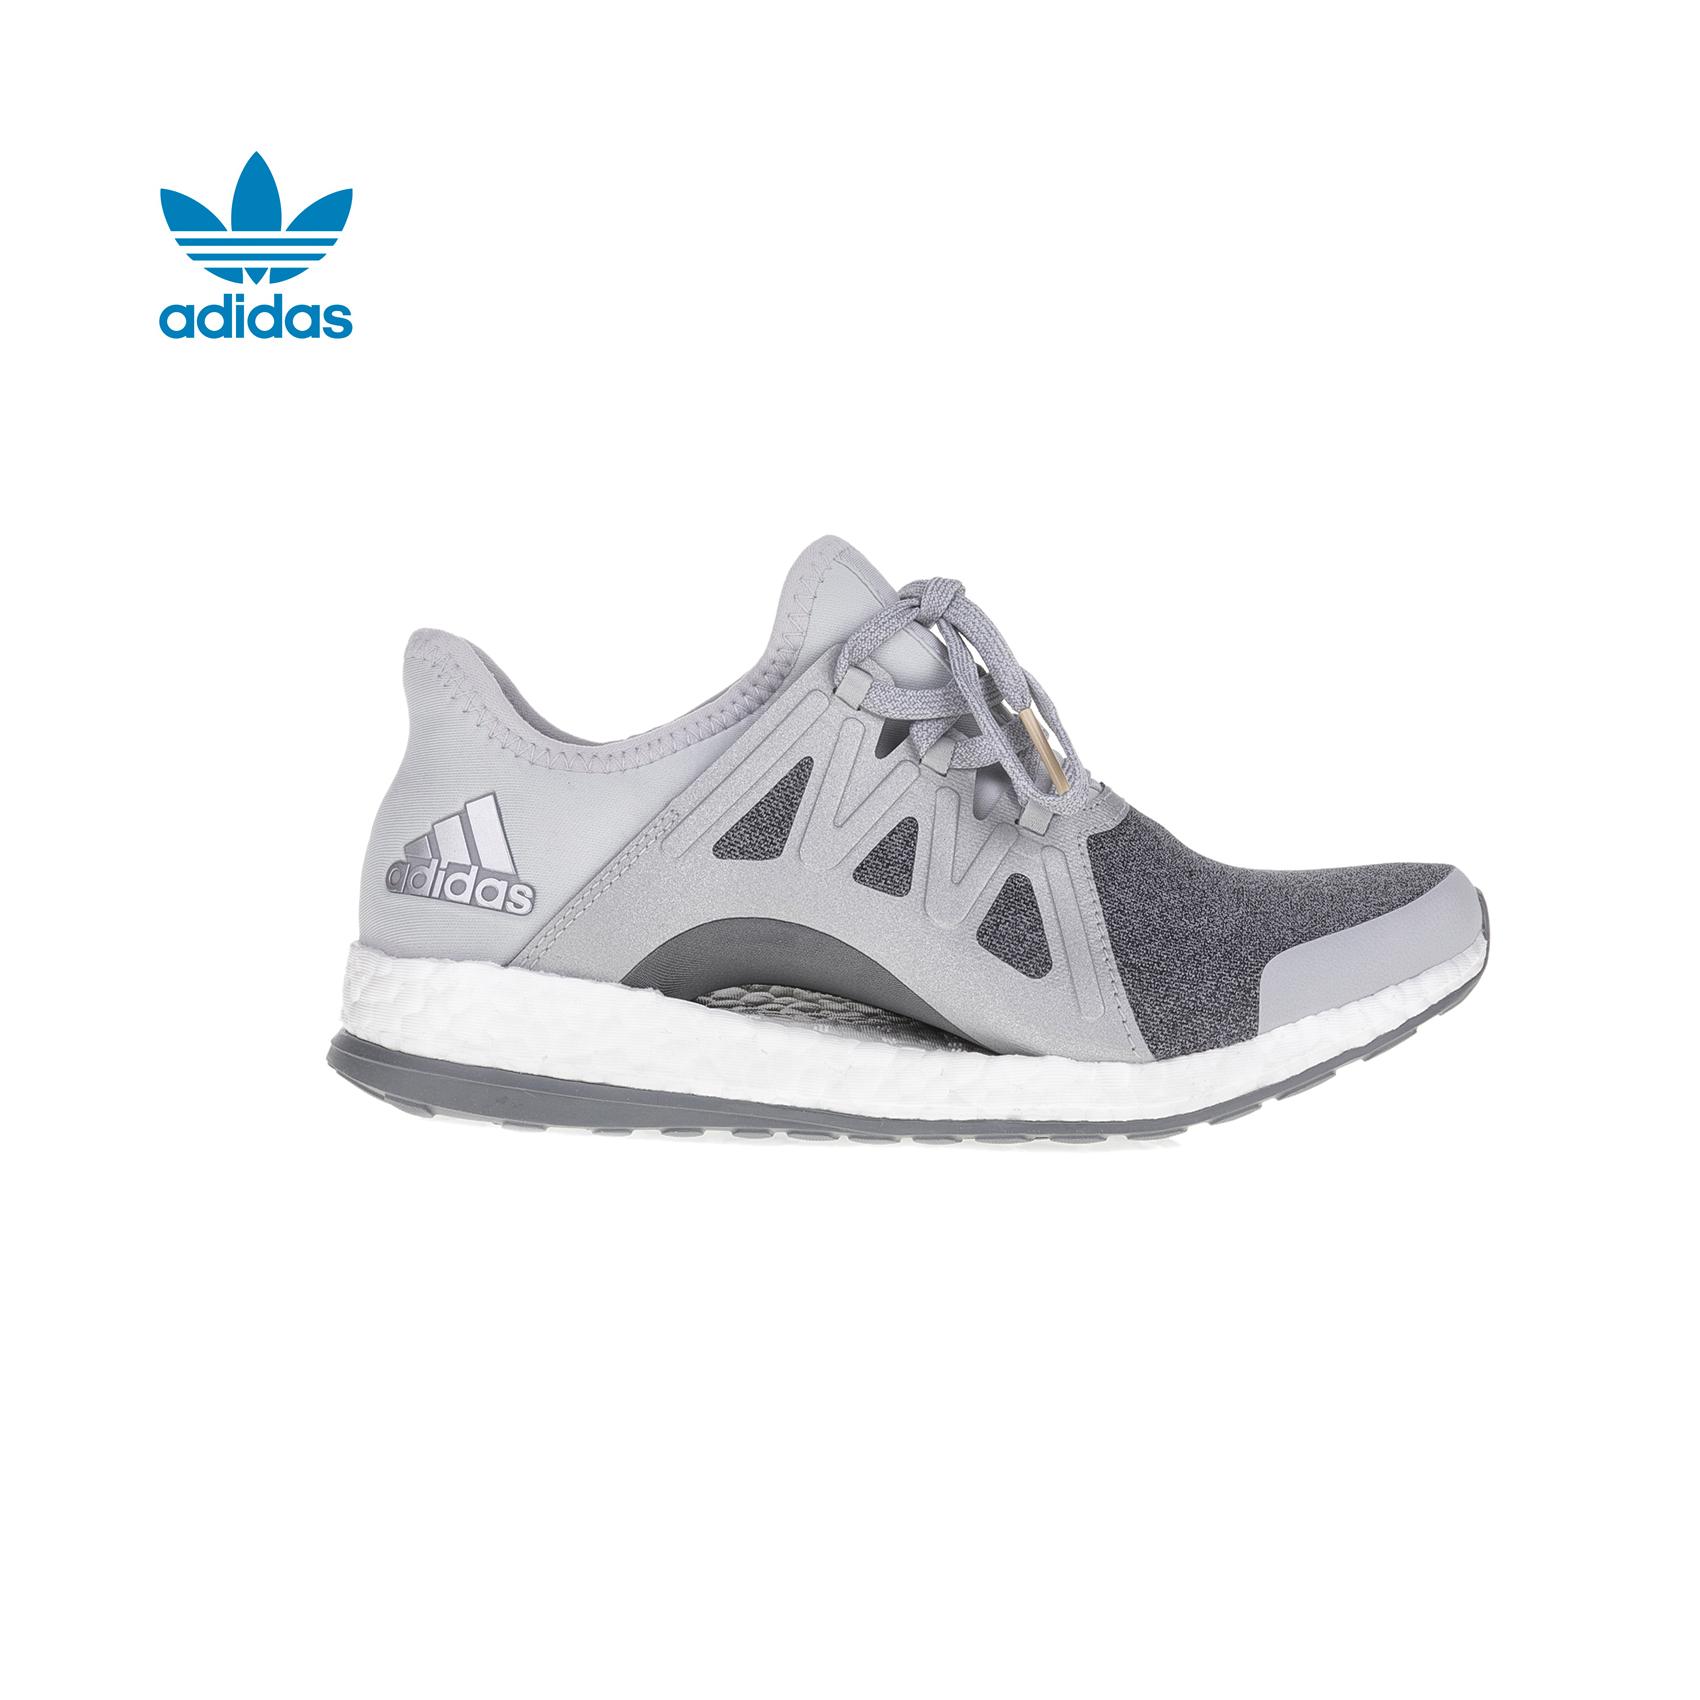 adidas Originals - Γυναικεία παπούτσια adidas PureBOOST X 2 γκρι γυναικεία παπούτσια αθλητικά running